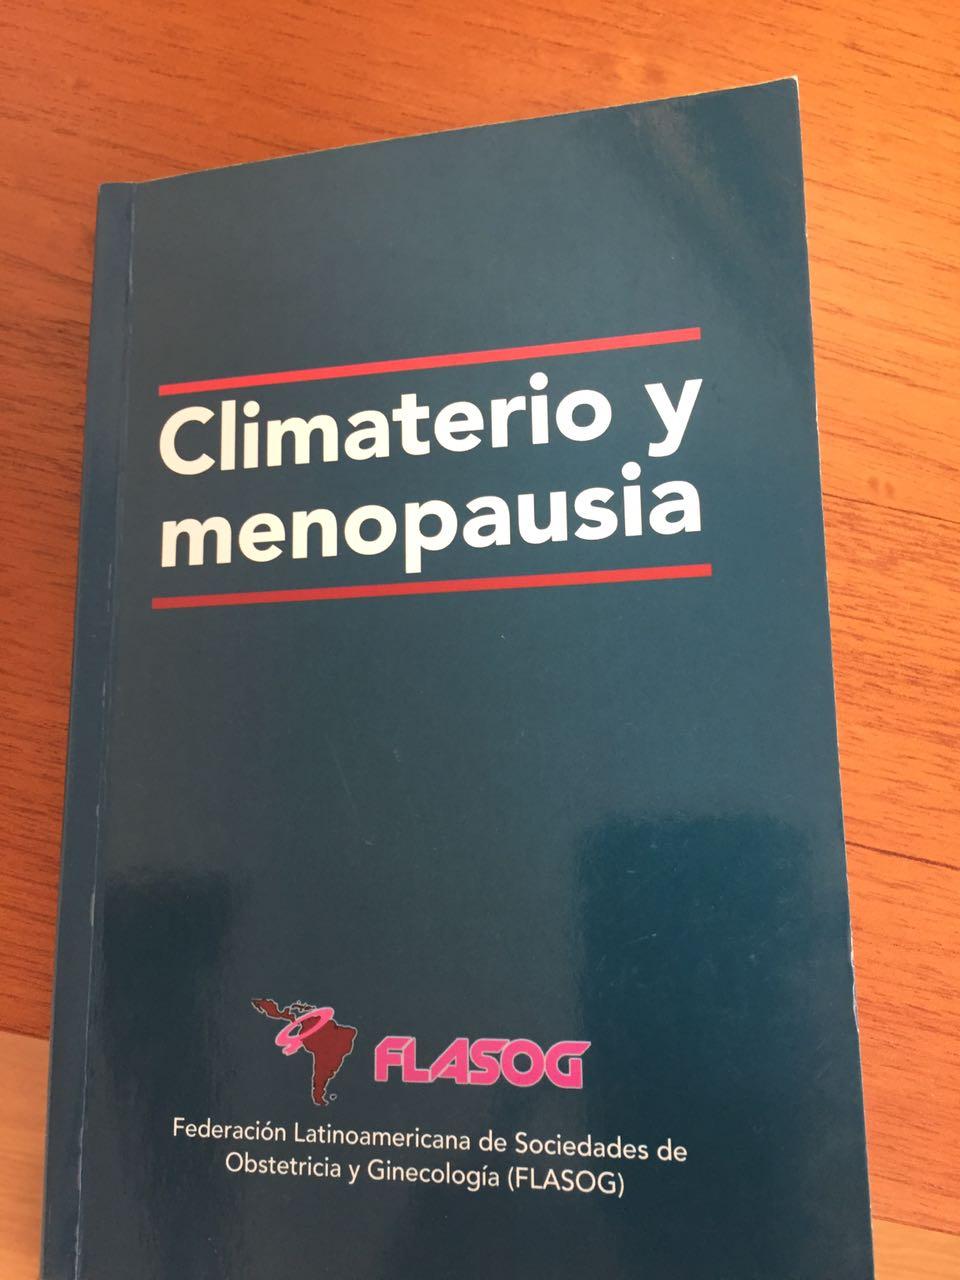 climaterioymenopausia.jpeg - 96.47 kb